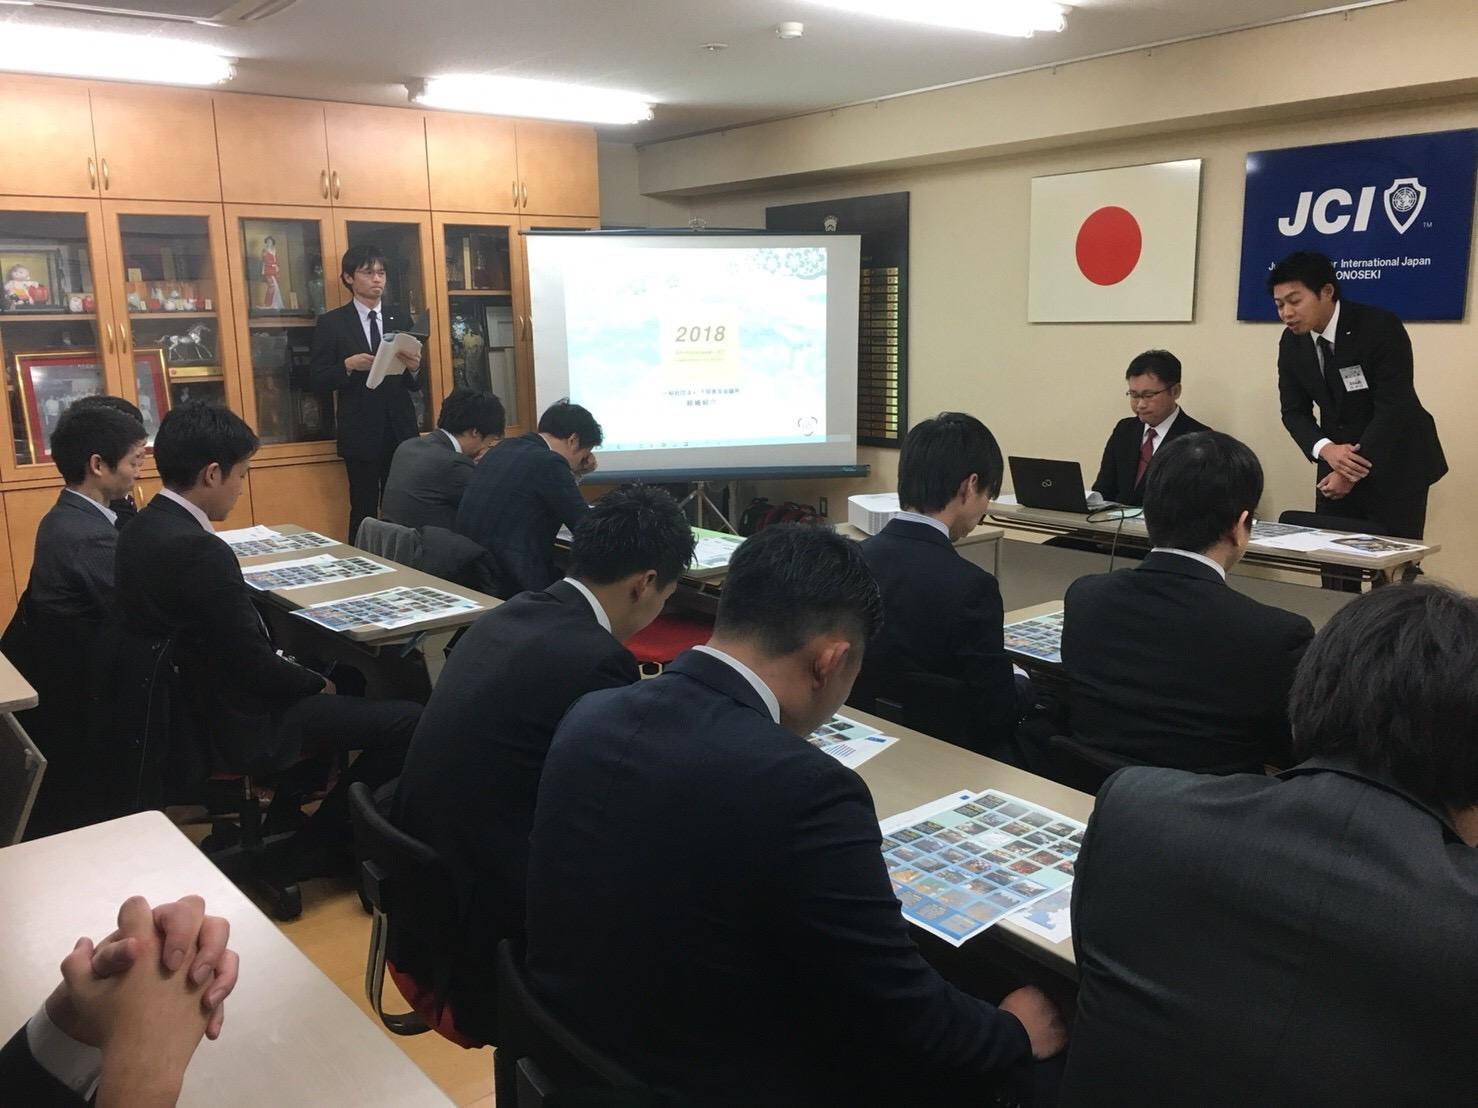 一般社団法人下関青年会議所2018年度説明会のサムネイル画像4